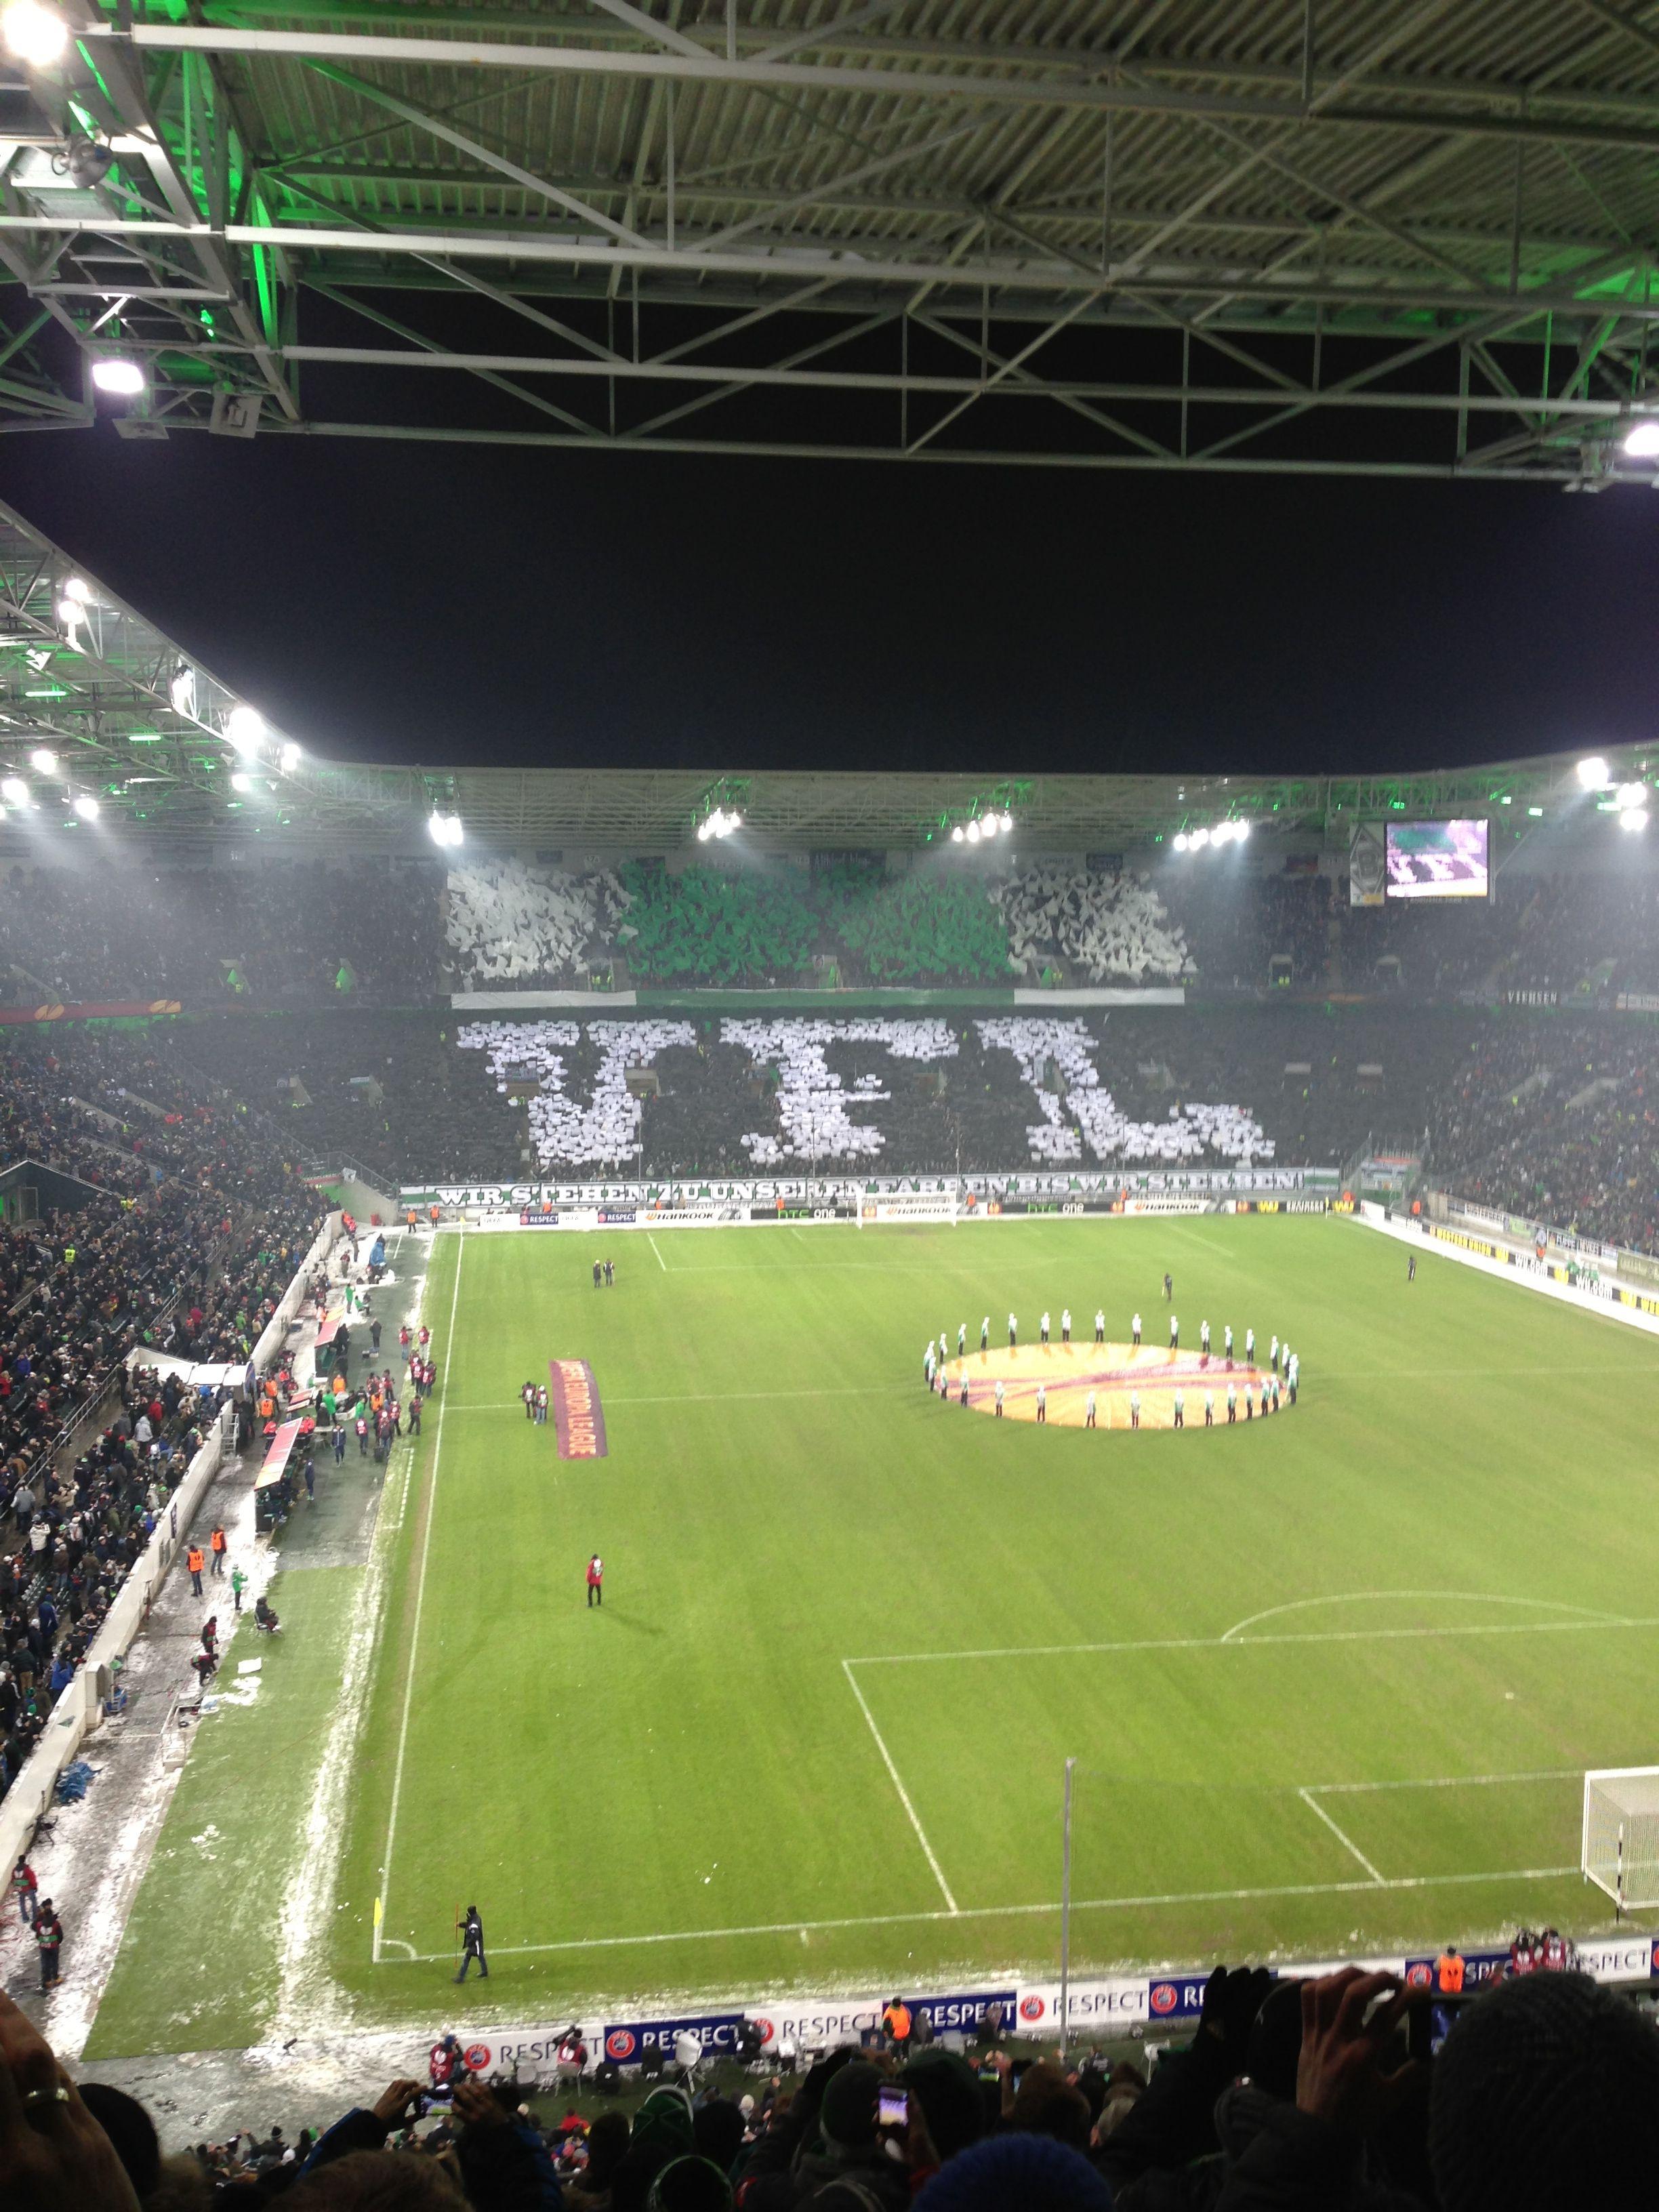 Borussia Monchengladbach Stadion Im Borussia Park 09 Borussia Monchengladbach Borussia Vfl Borussia Monchengladbach